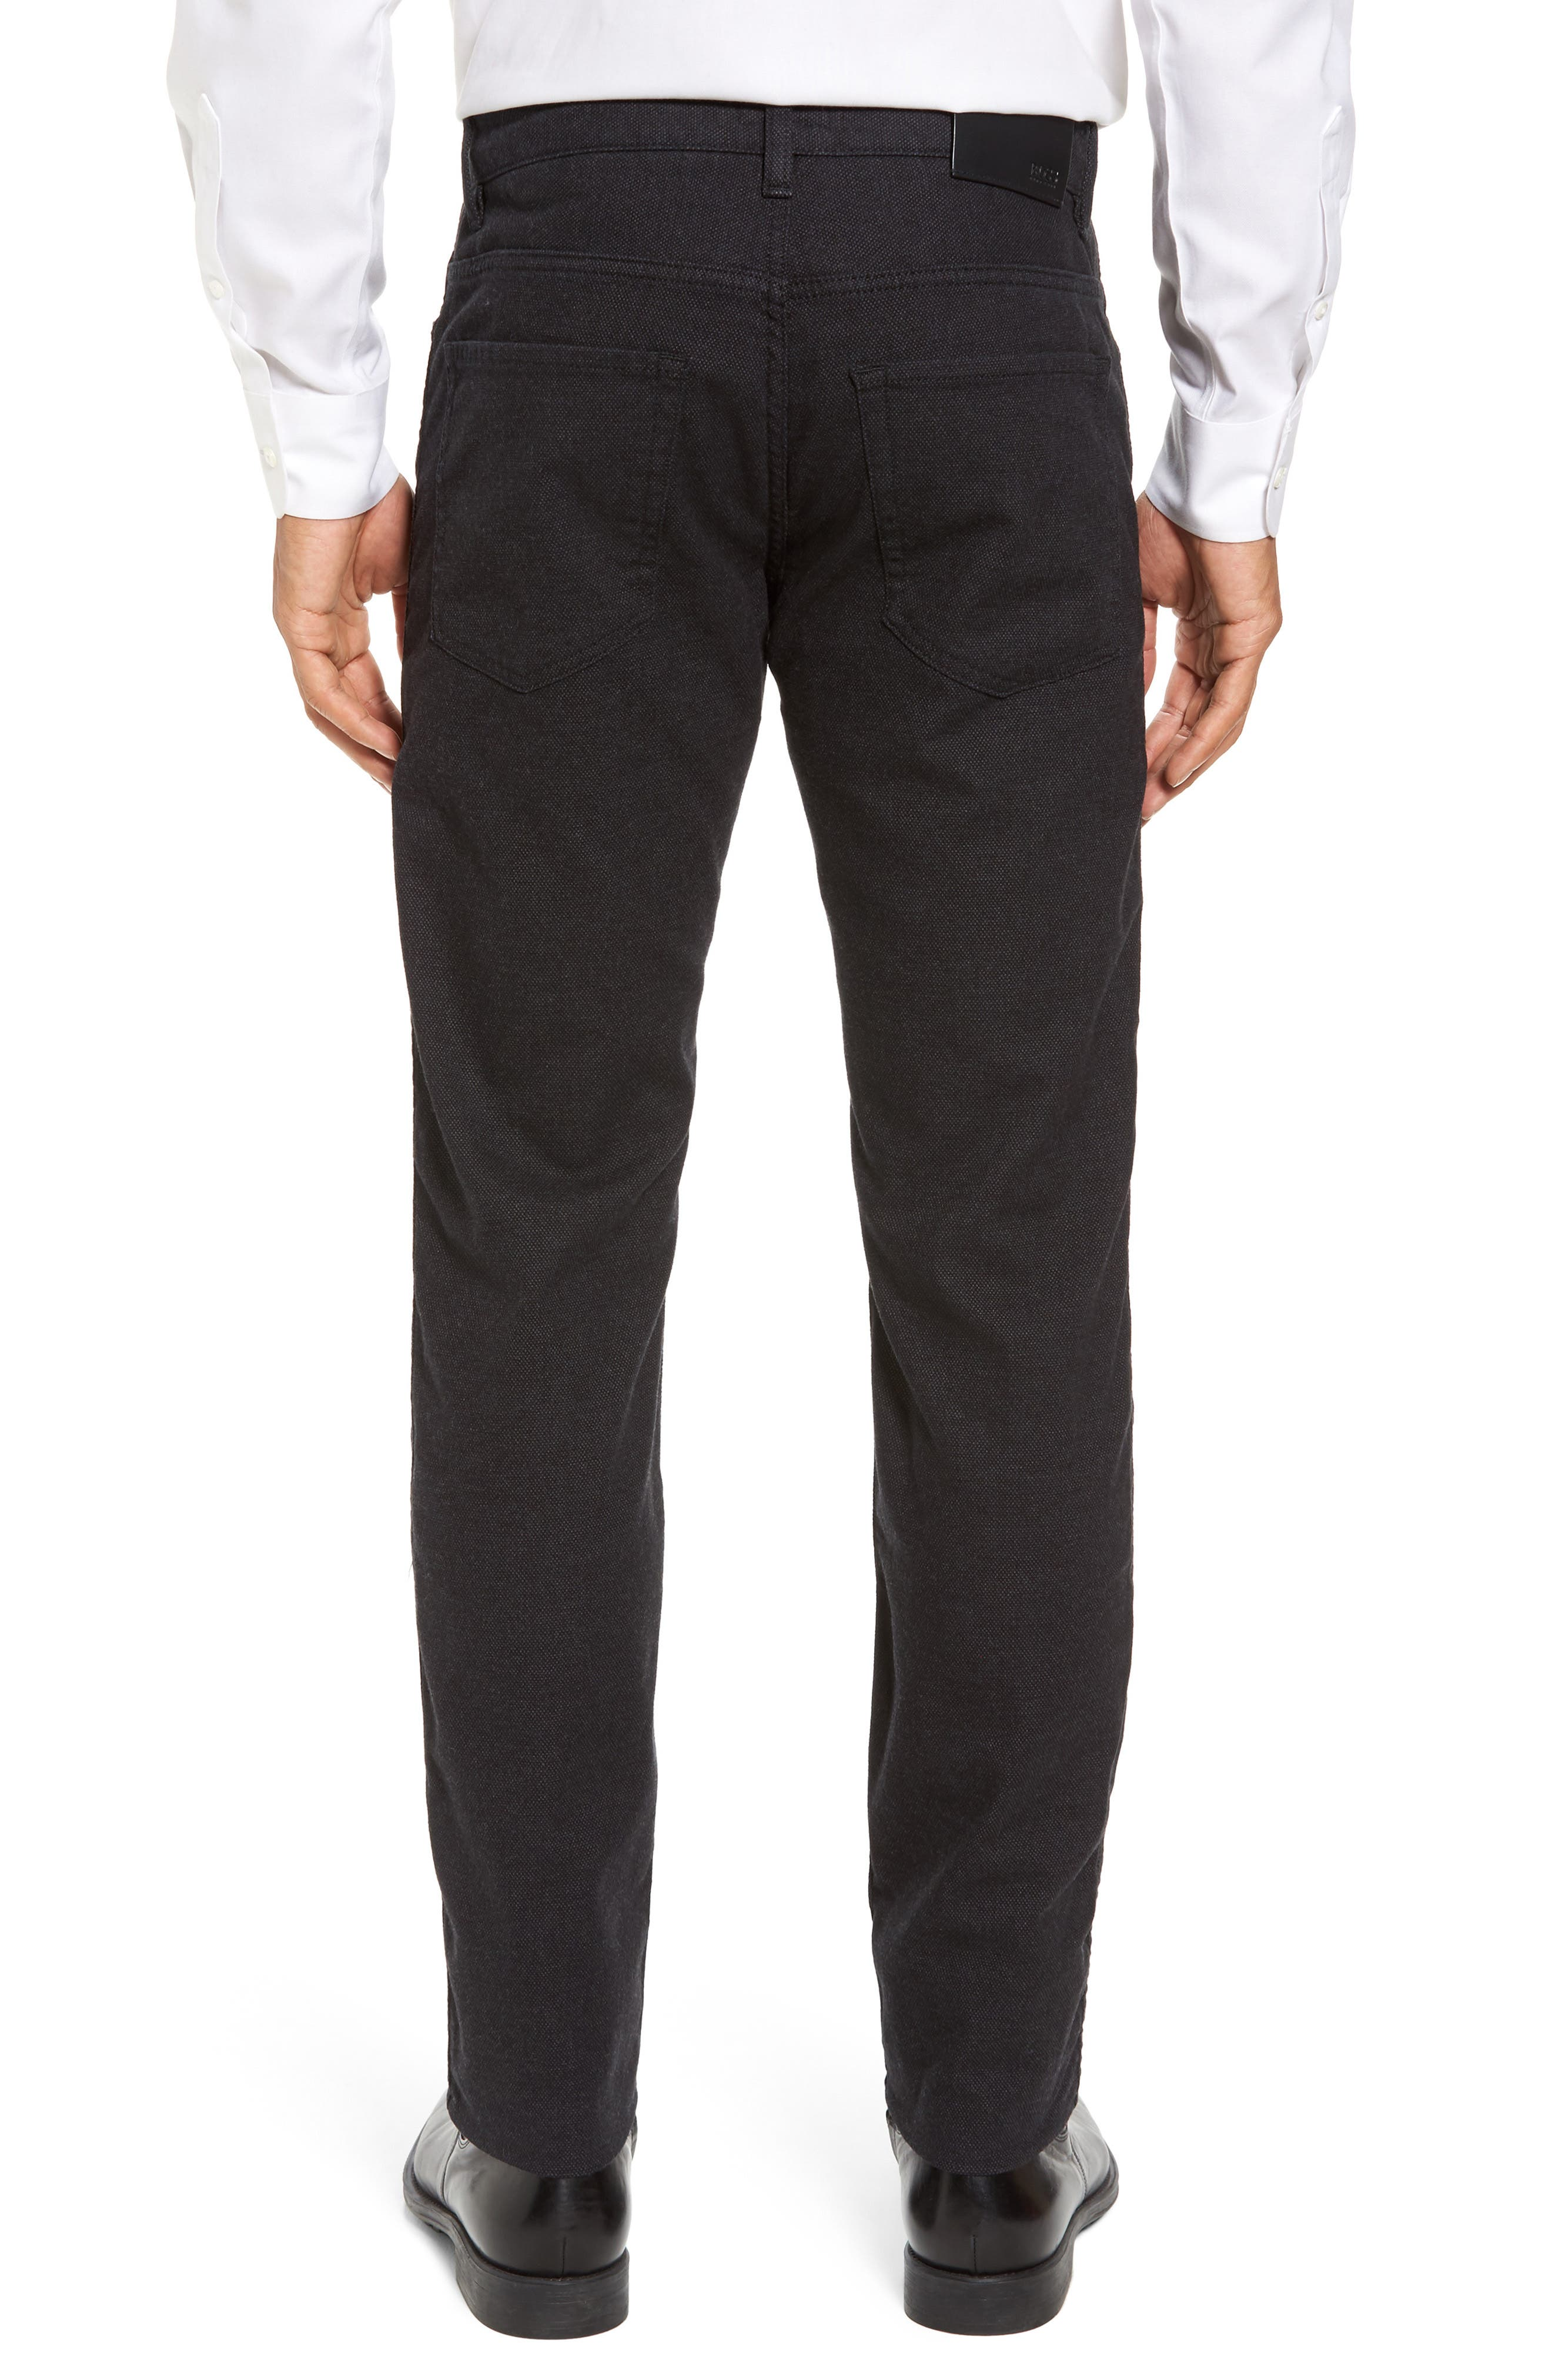 Delaware Slim 5-Pocket Pants,                             Alternate thumbnail 2, color,                             022